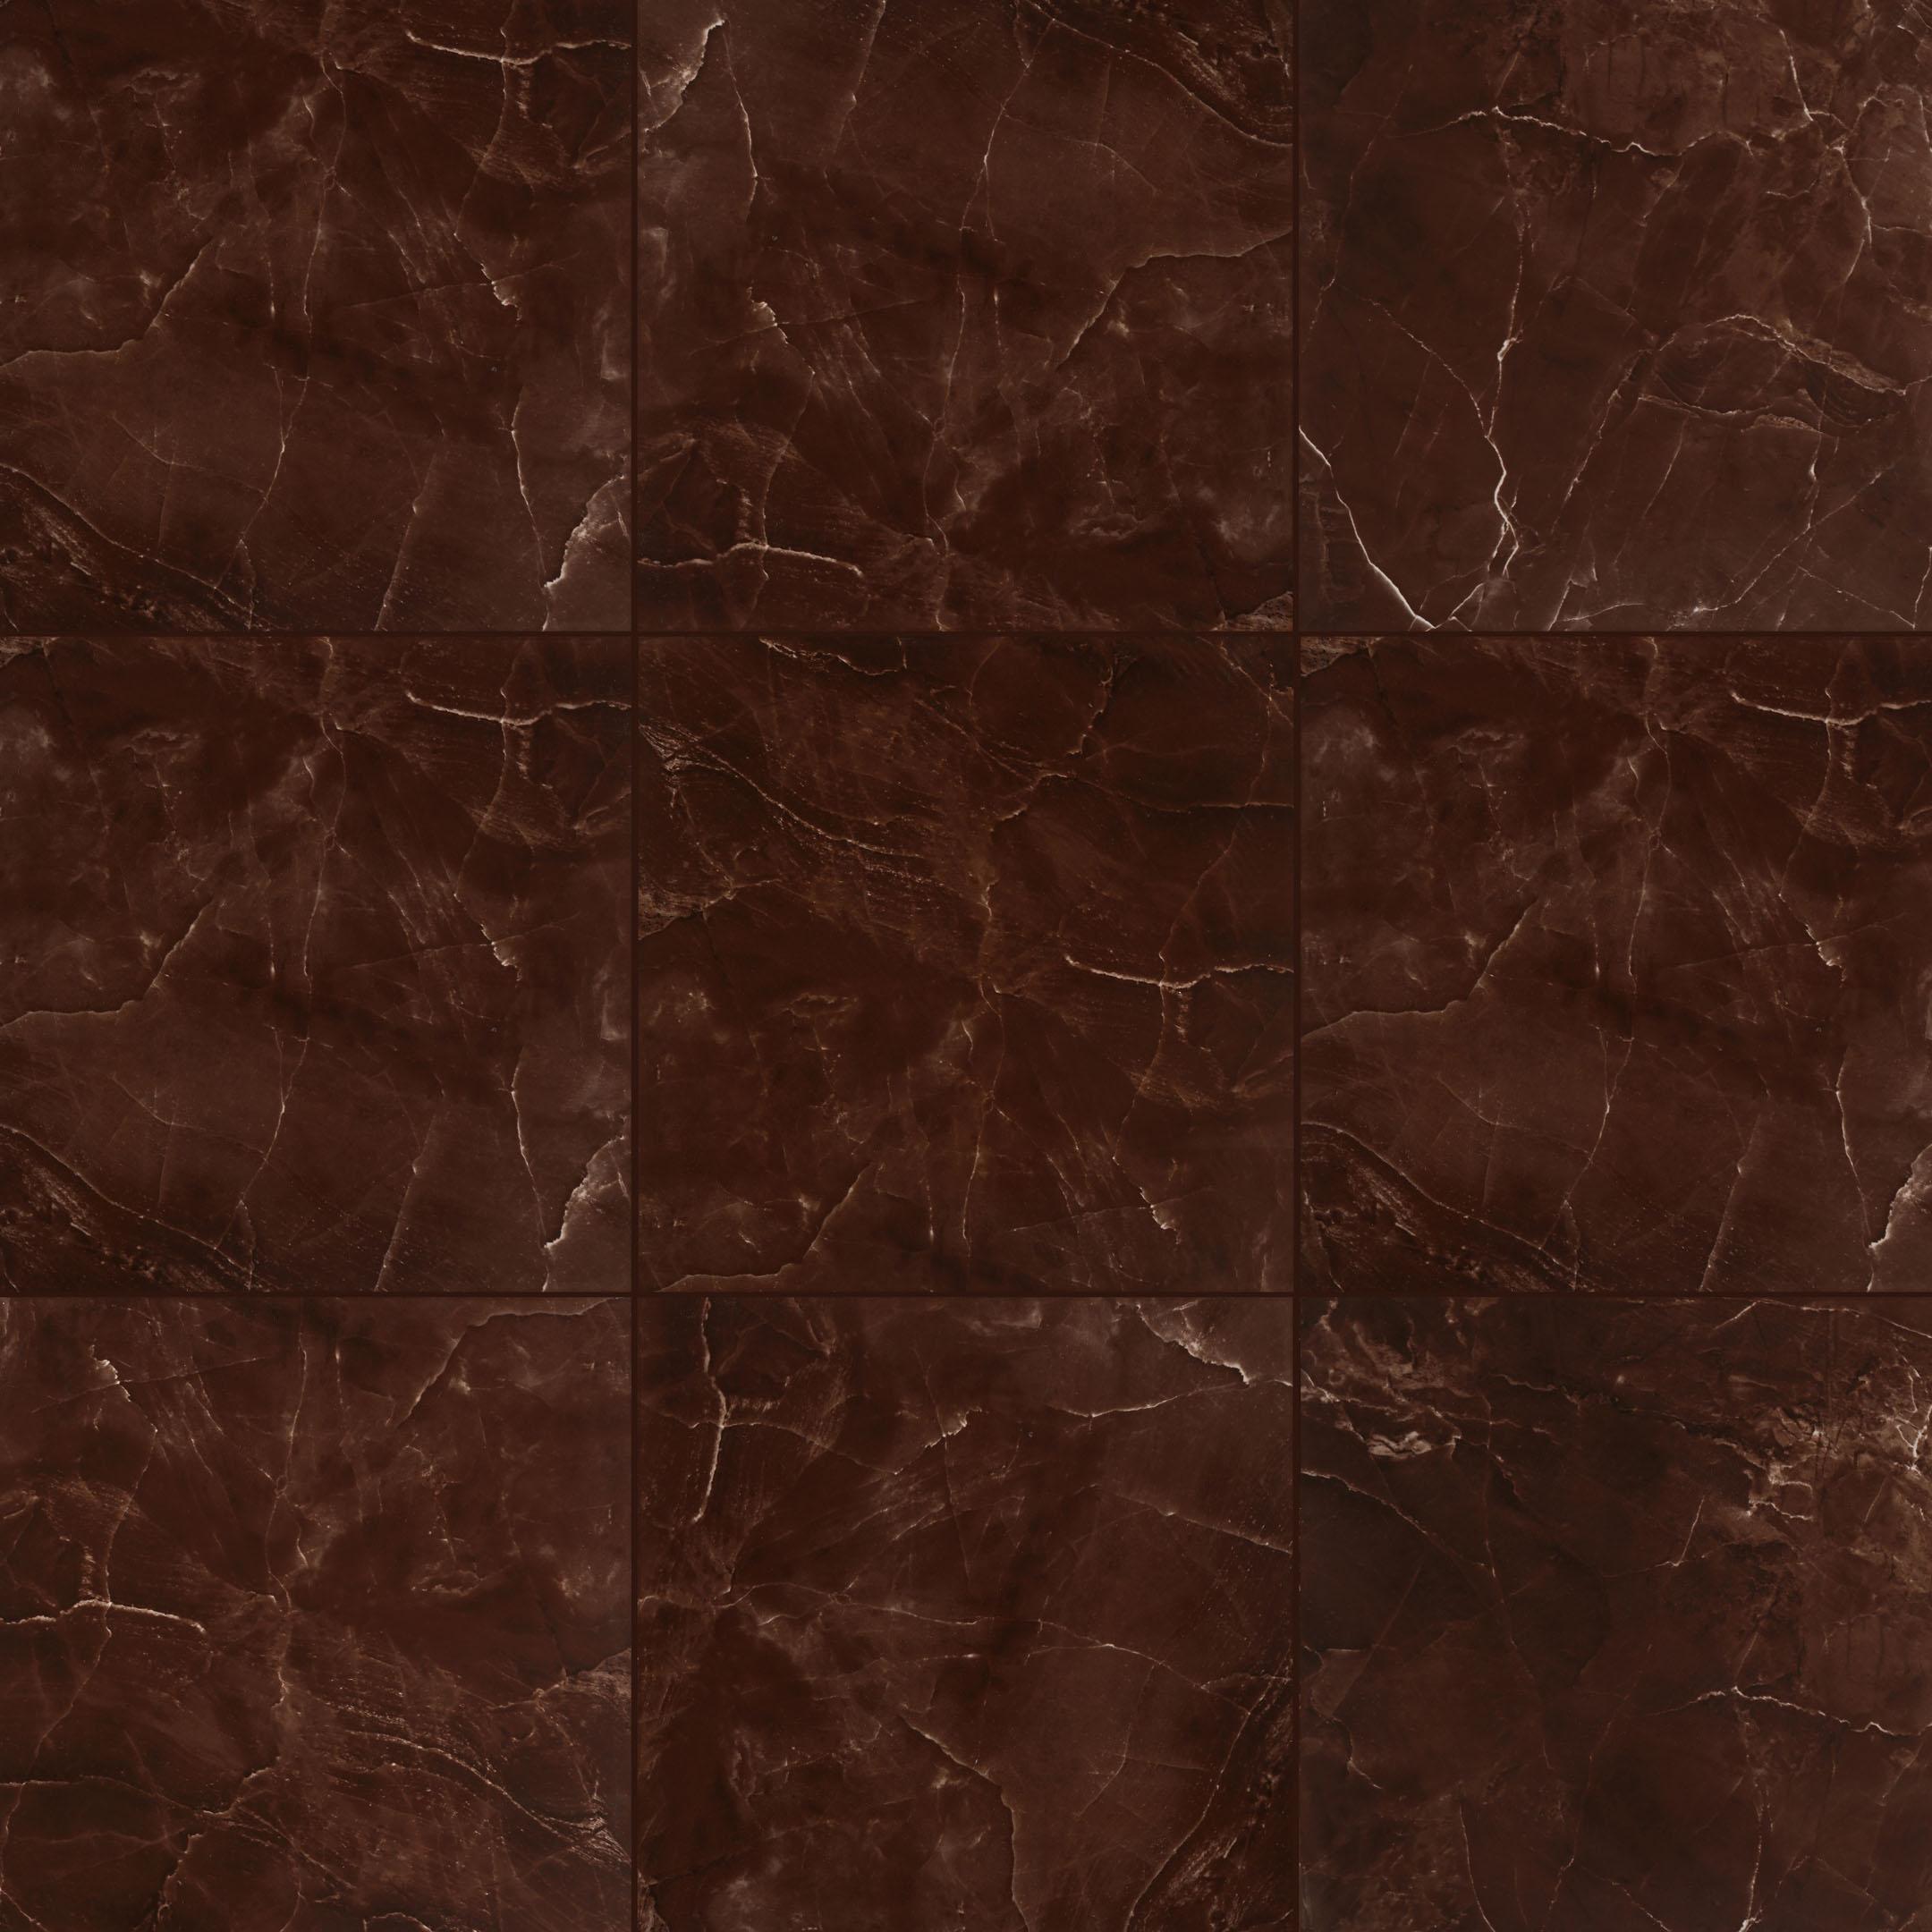 Керамогранит Grasaro Atrium коричневый 400х400х8 мм (10 шт.=1,6 кв.м) керамогранит grasaro atrium серый 400х400х8 мм 10 шт 1 6 кв м